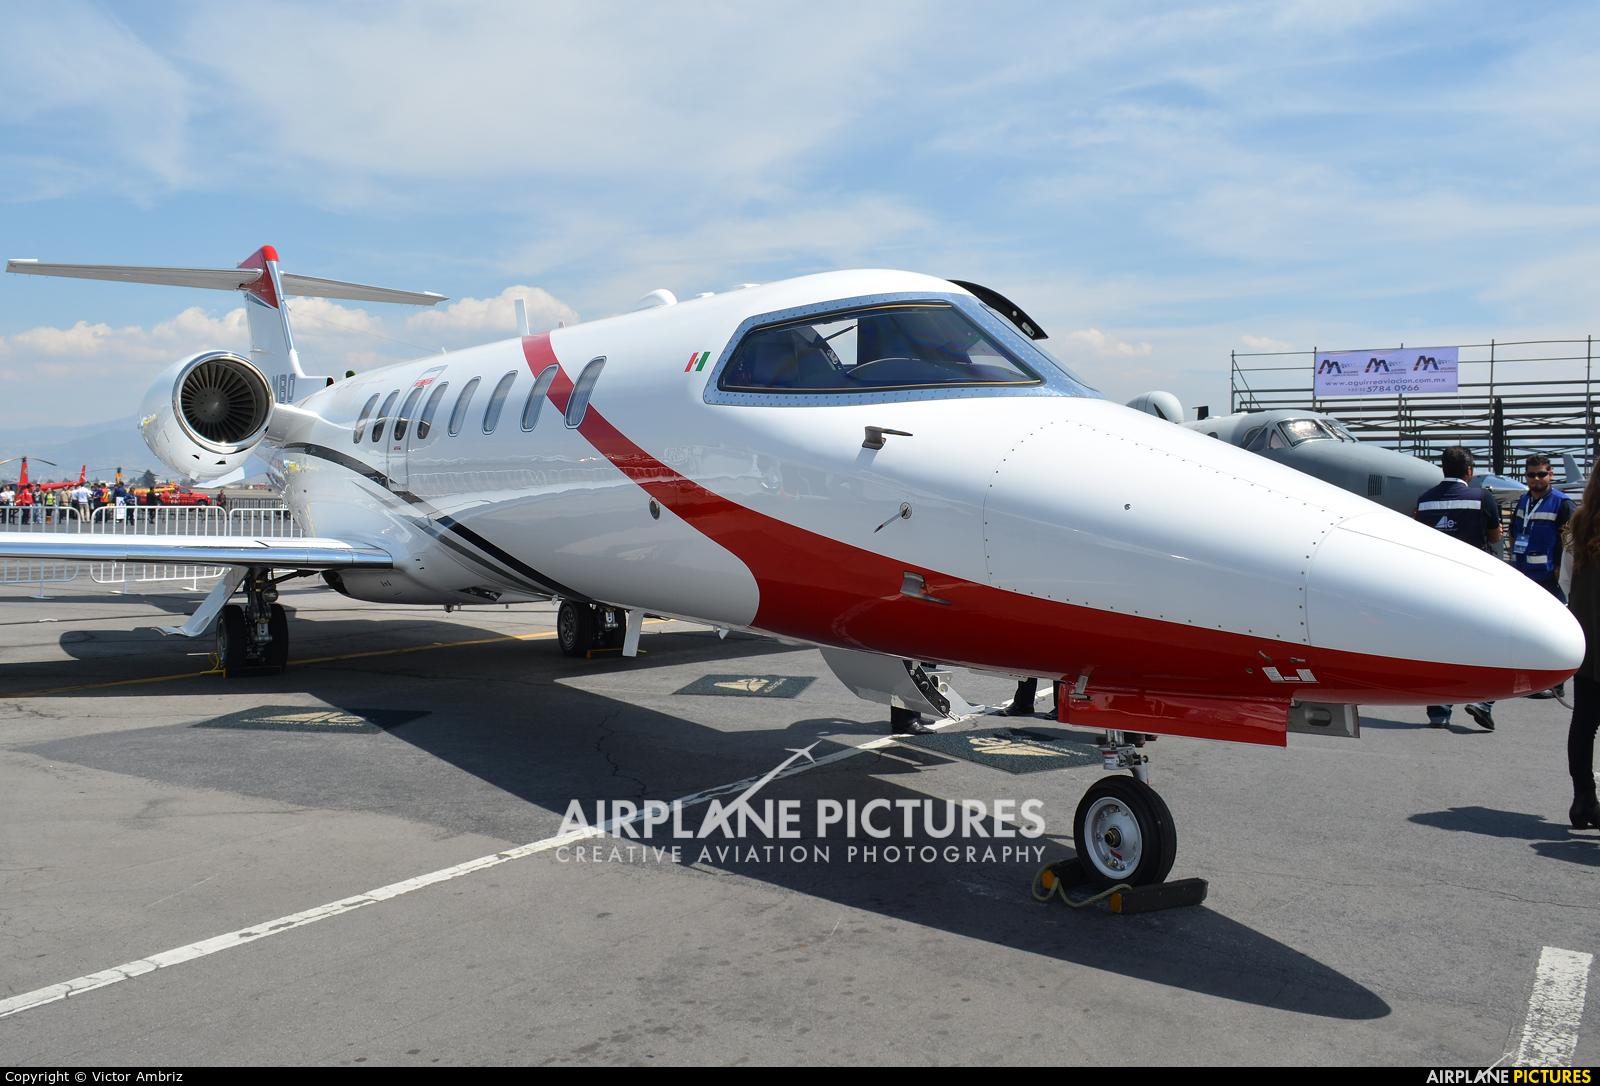 Aerolineas Ejecutivas XA-MBO aircraft at Toluca Intl